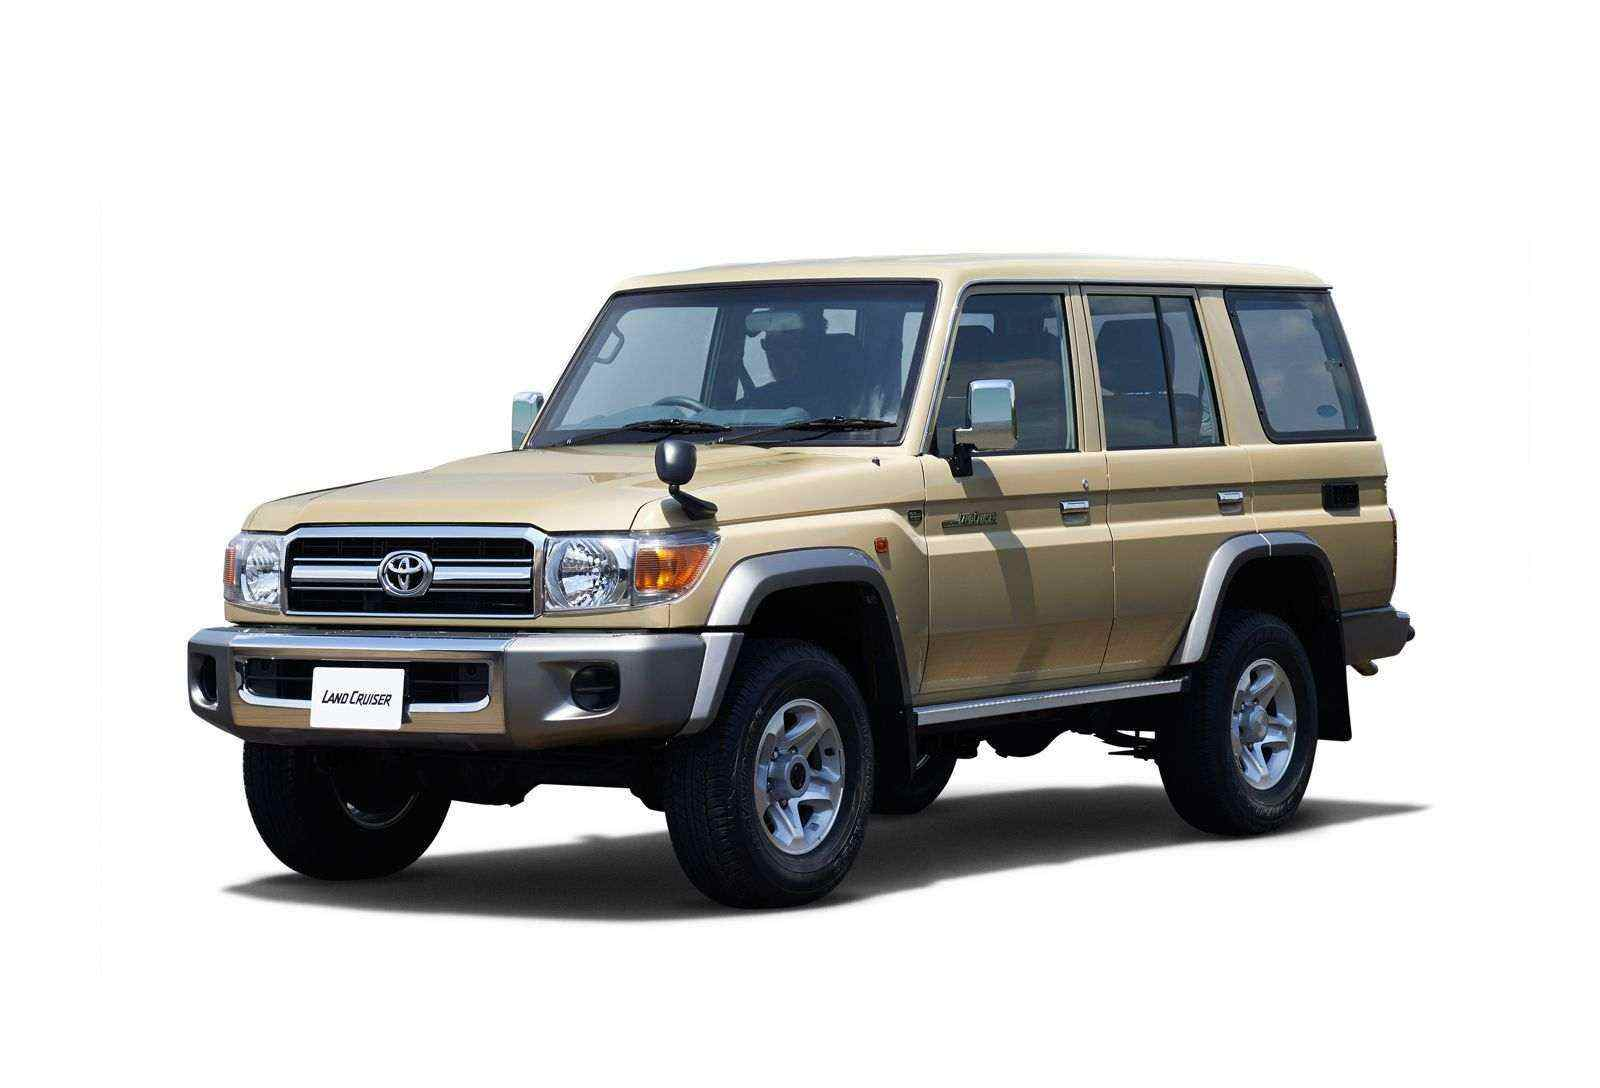 Toyota-Land-Cruiser-70-Series-12